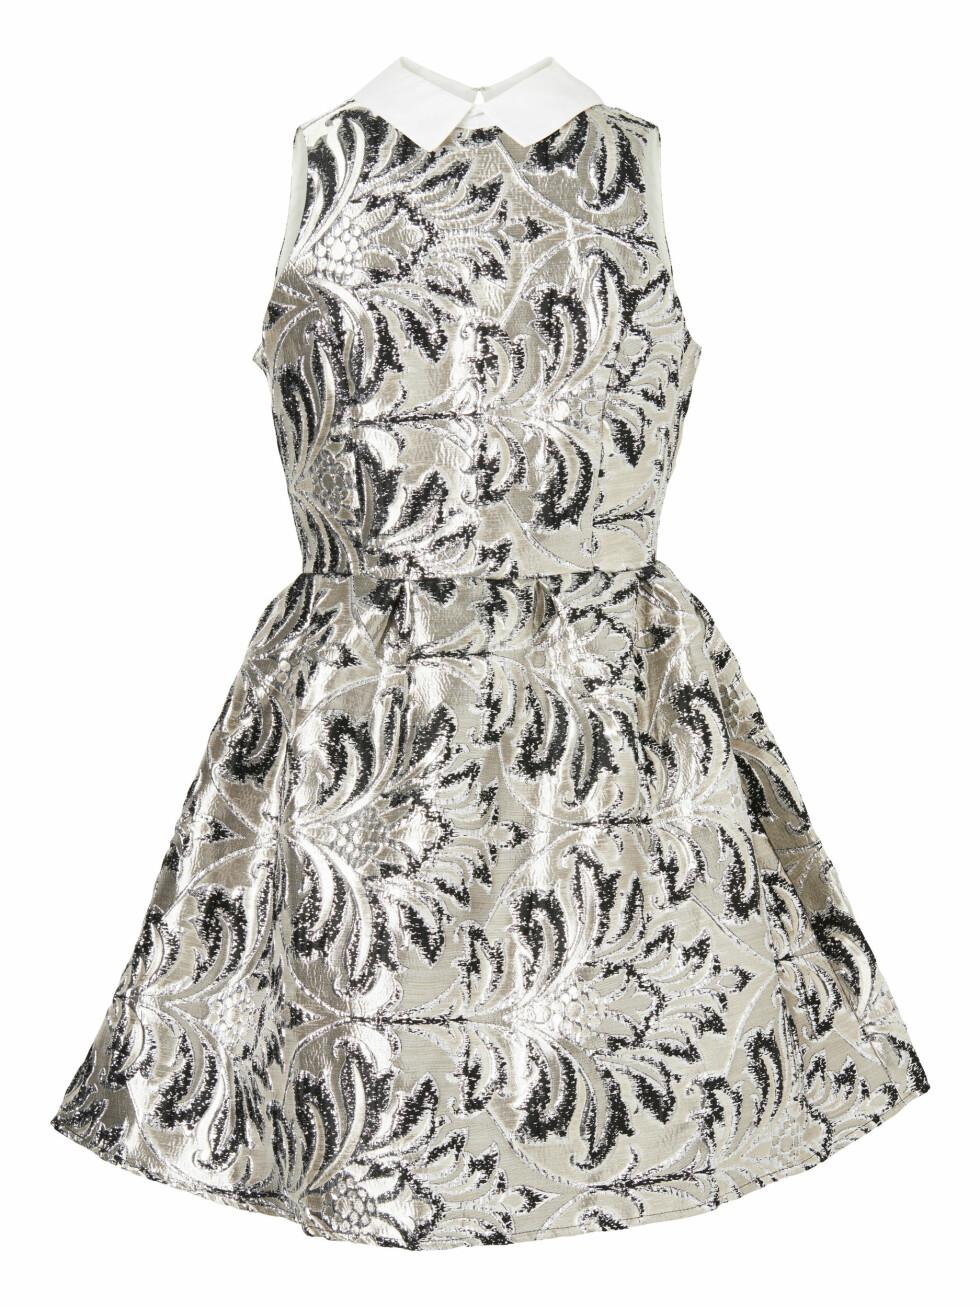 Kjole fra Lily Allen x Vero Moda, kr 649. Foto: Vero Moda